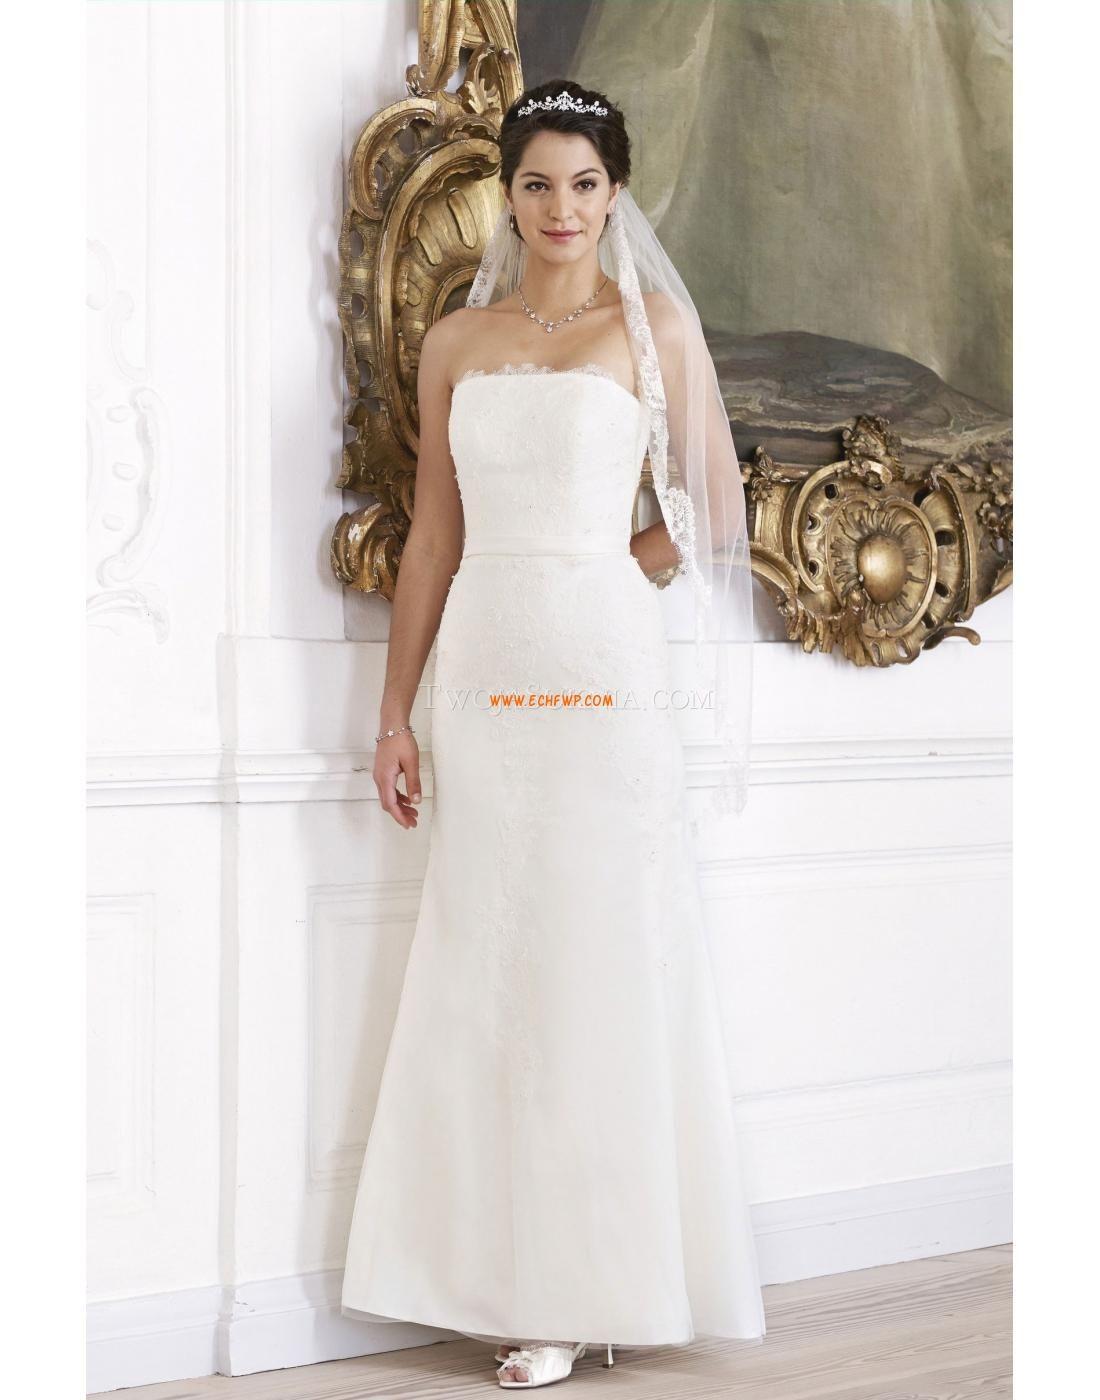 Sheath/Column Spring 2014 Sleeveless Traditional wedding dresses